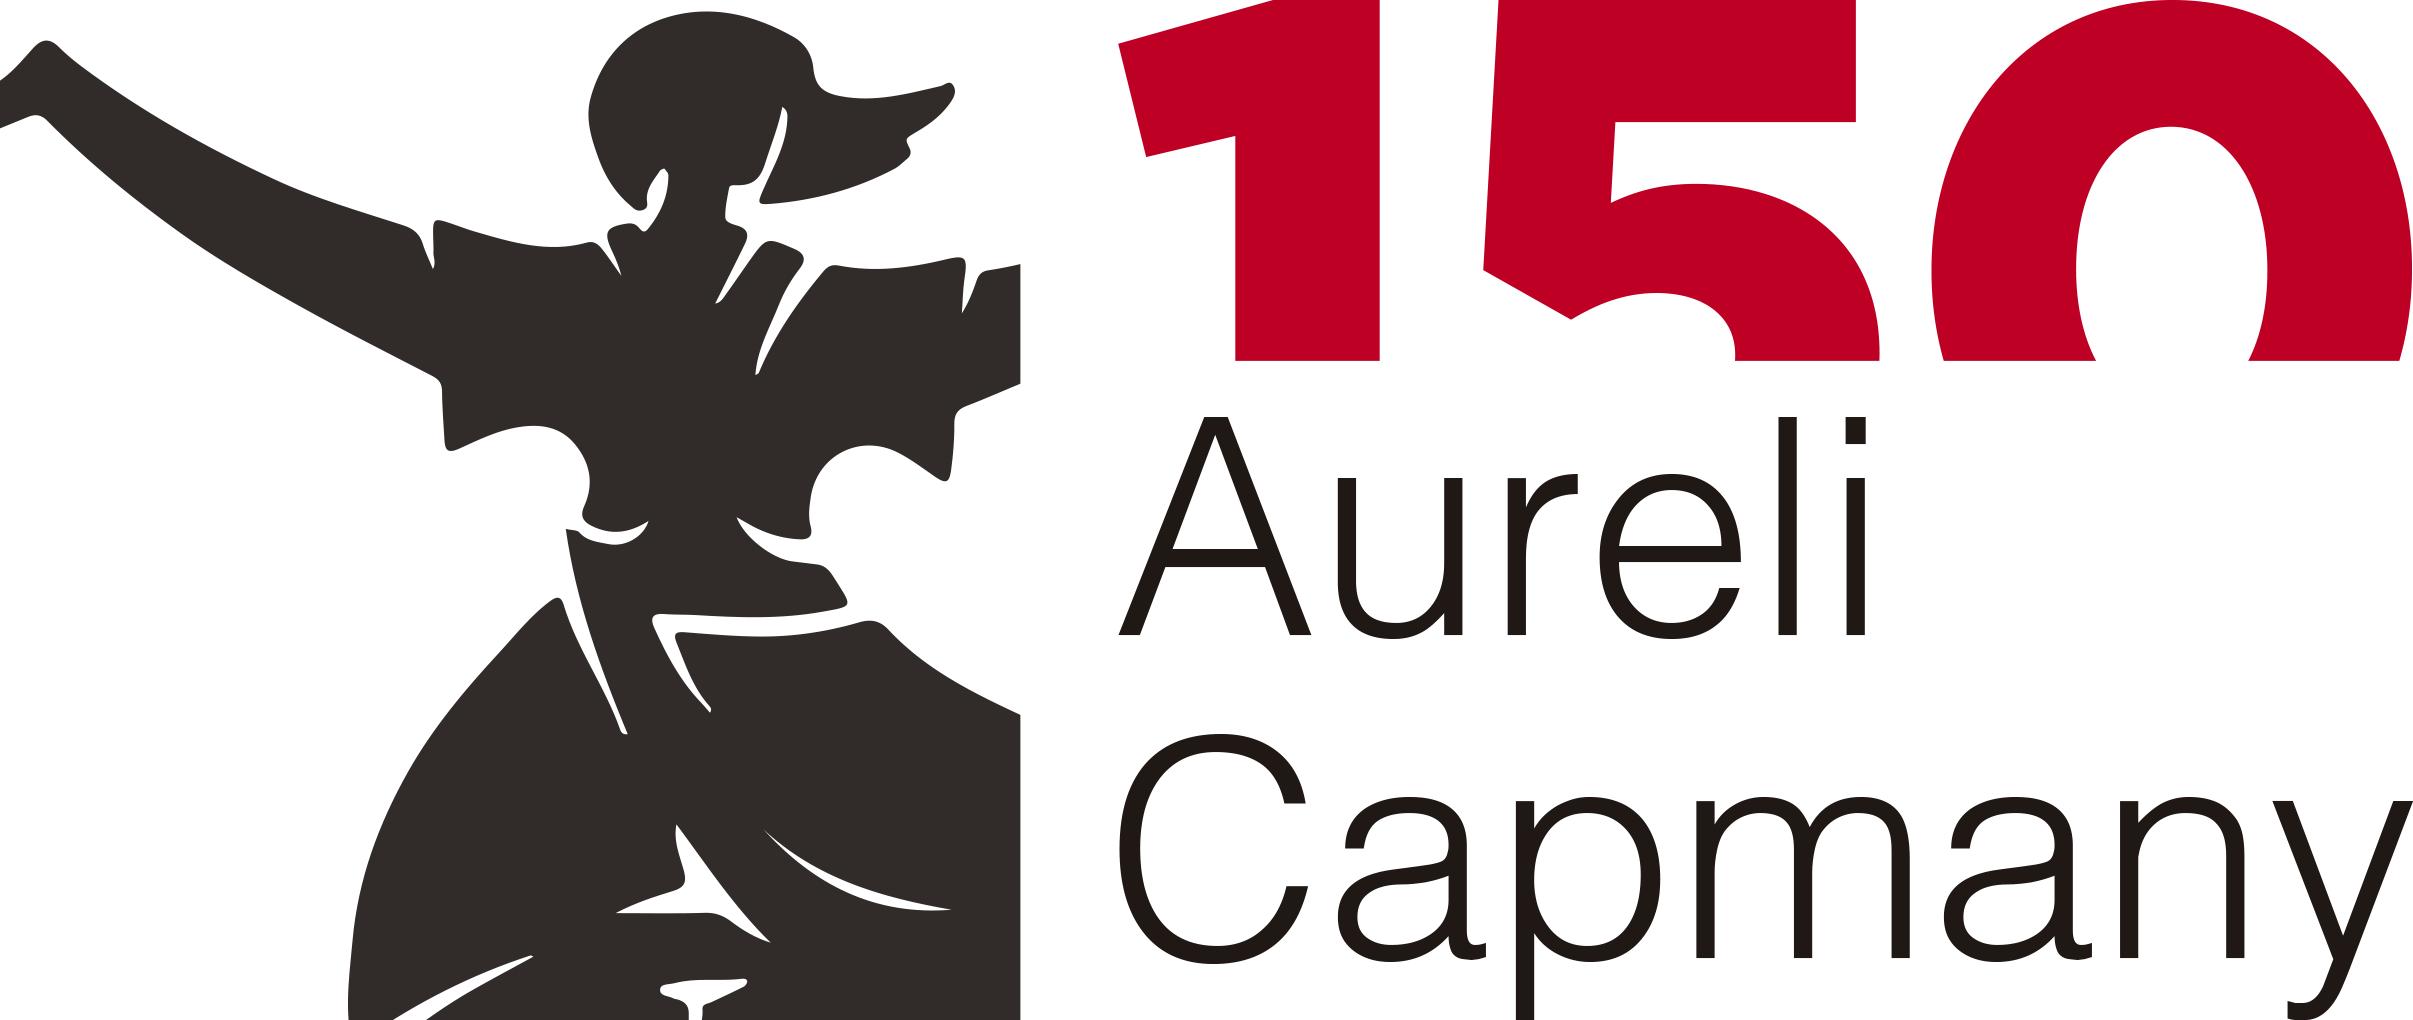 Aureli Capmany horitzontal